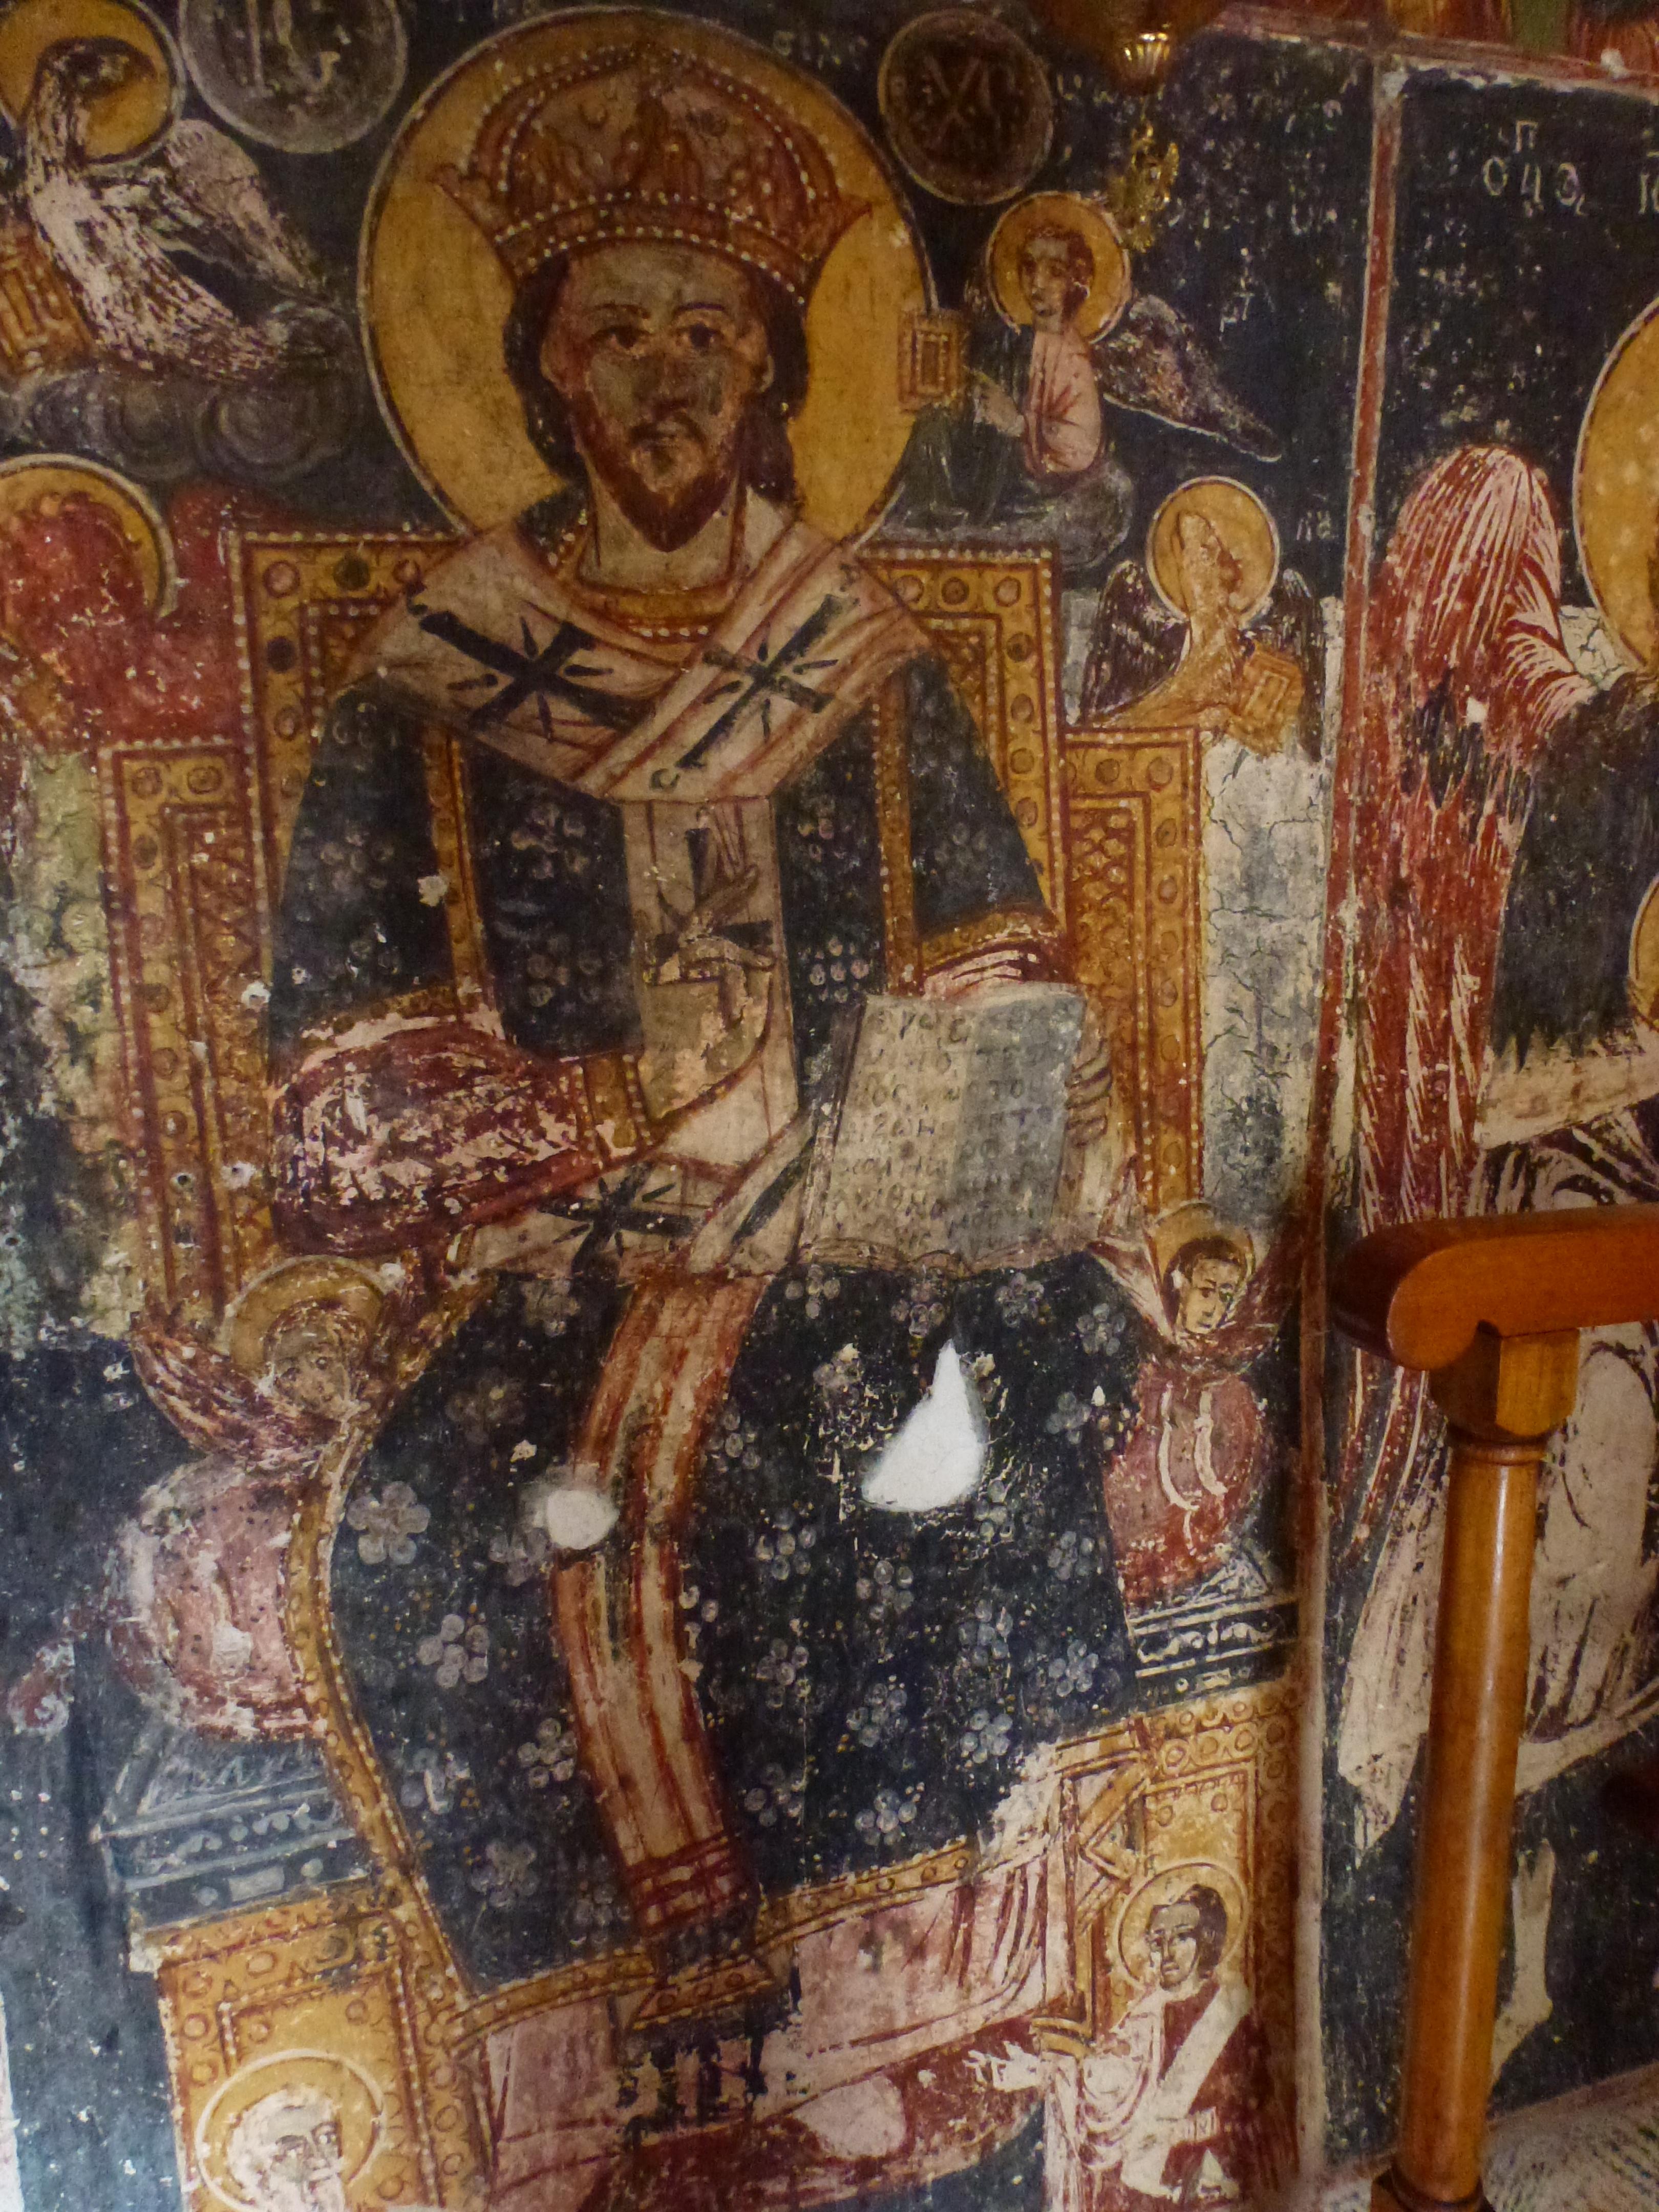 Fresco's inside the church.